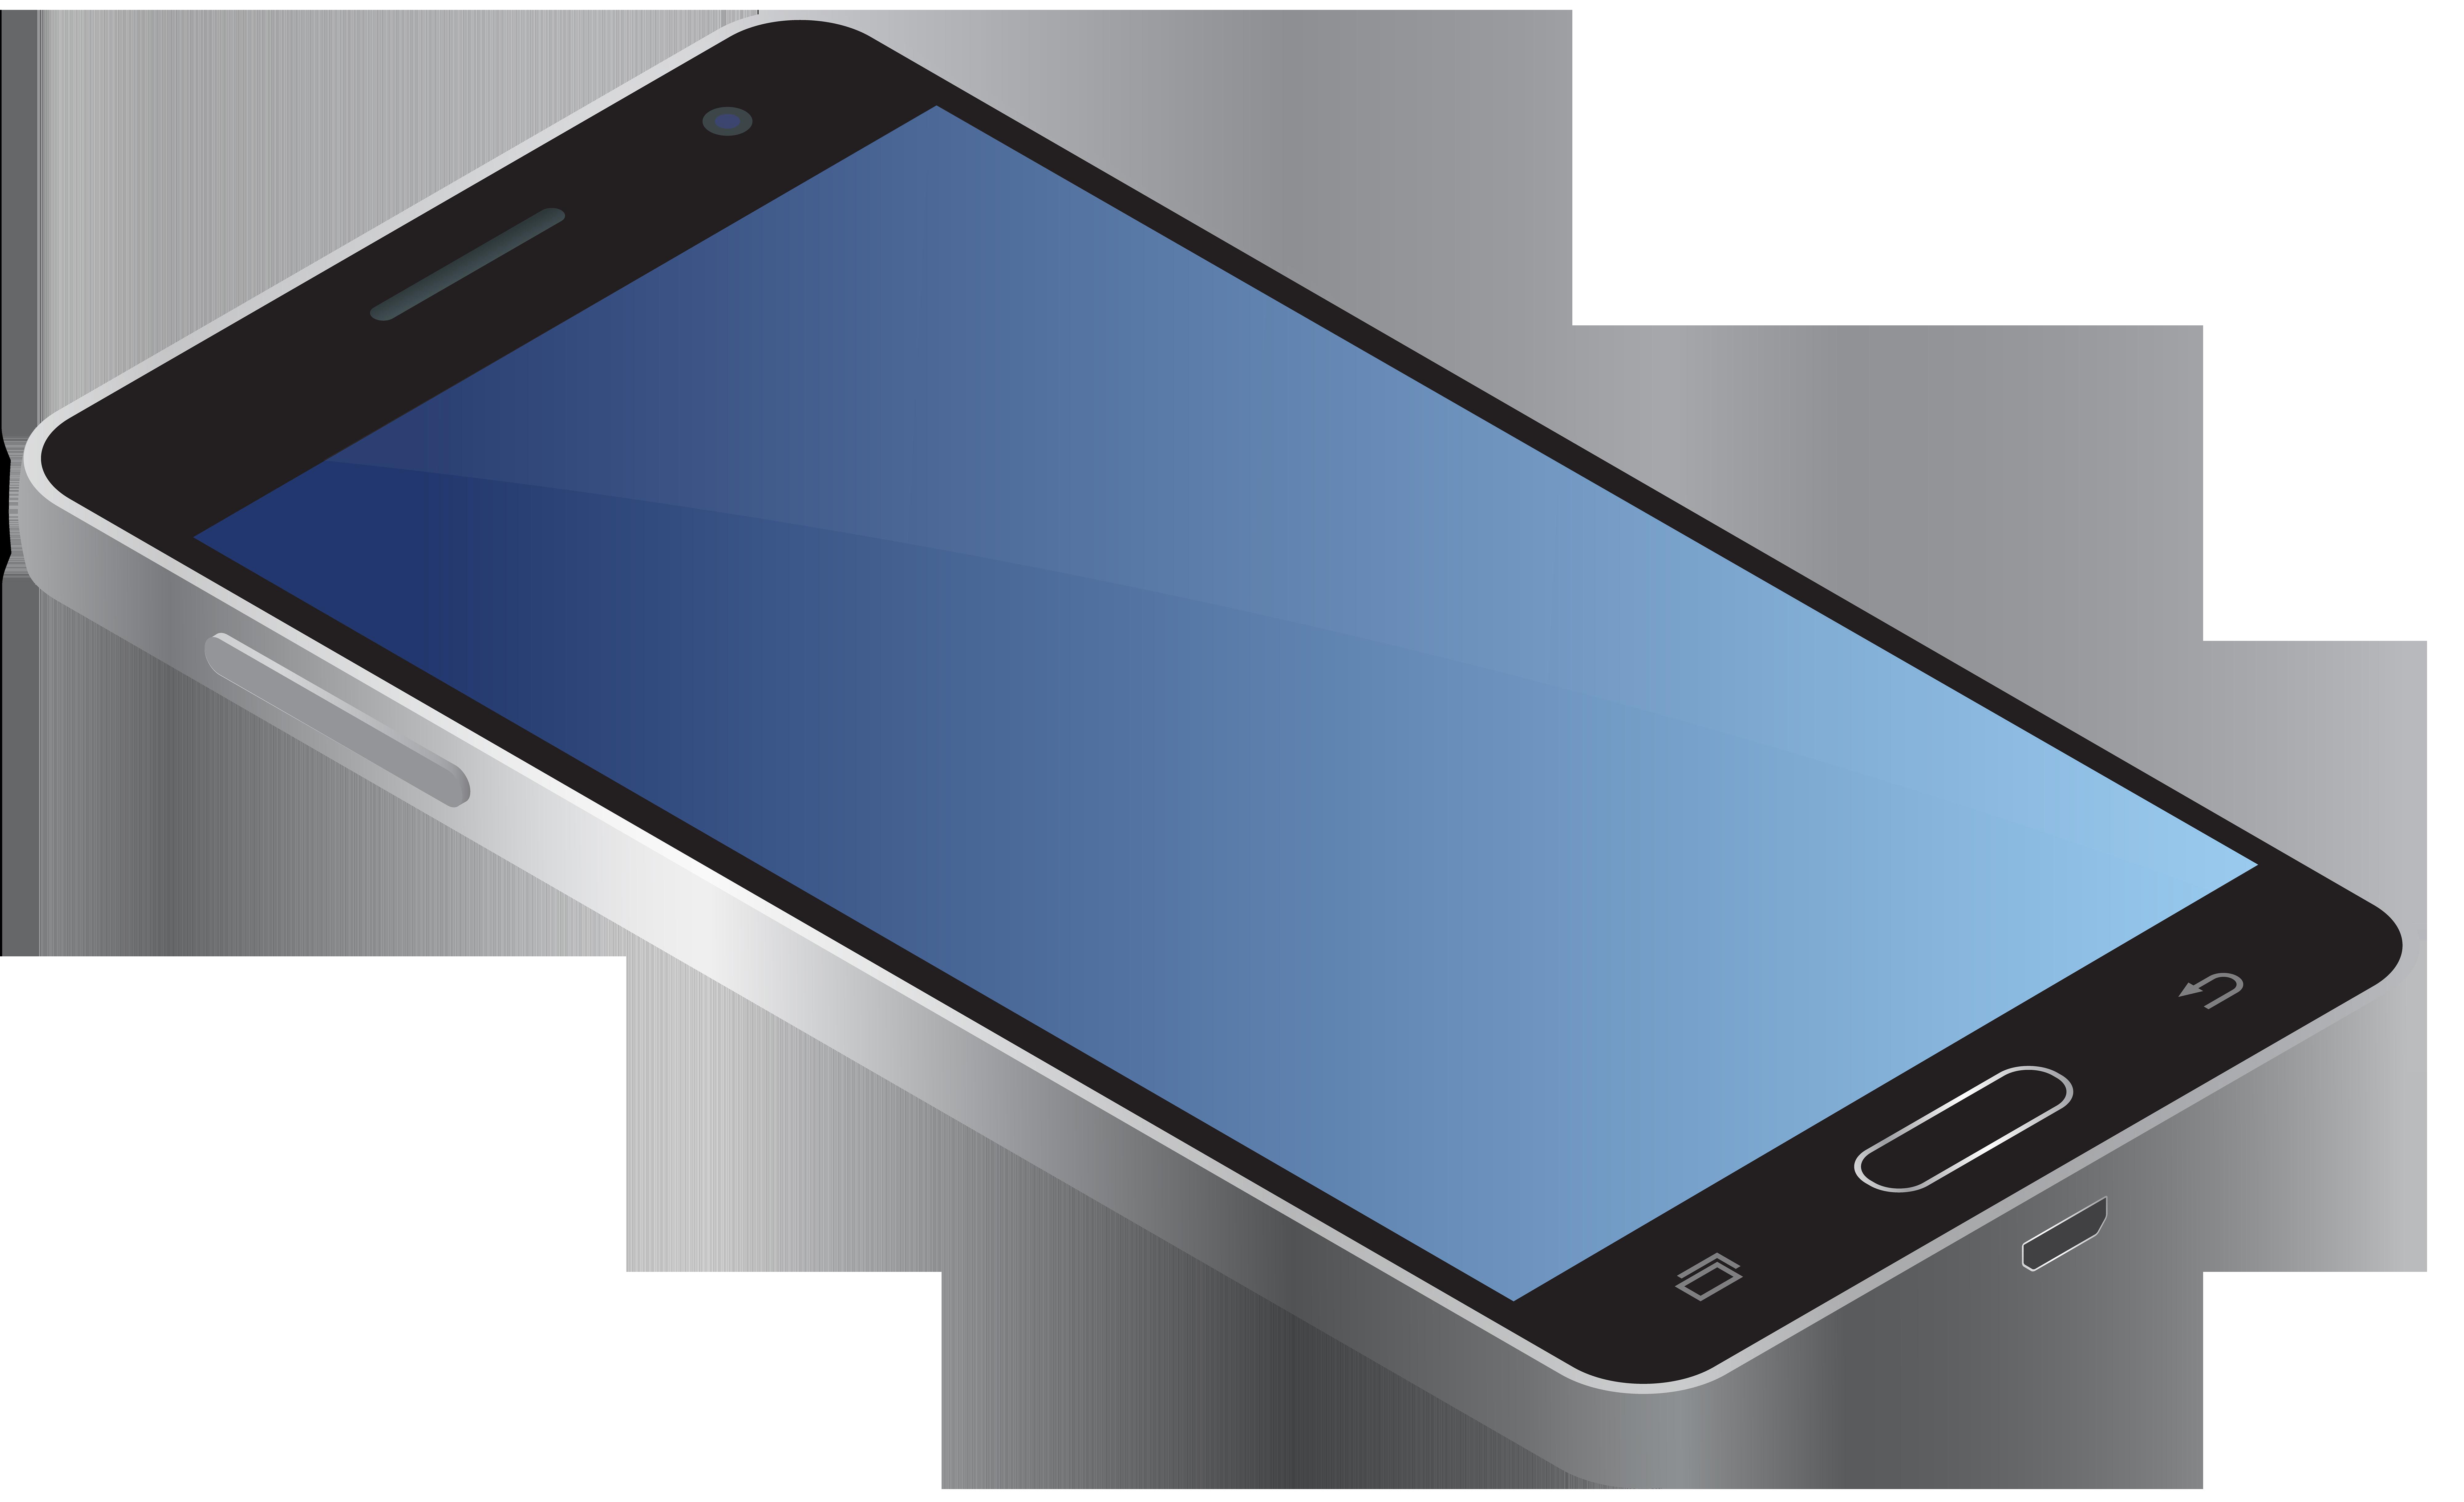 8000x4875 Mobile Phone Transparent Png Clip Art Imageu200b Gallery